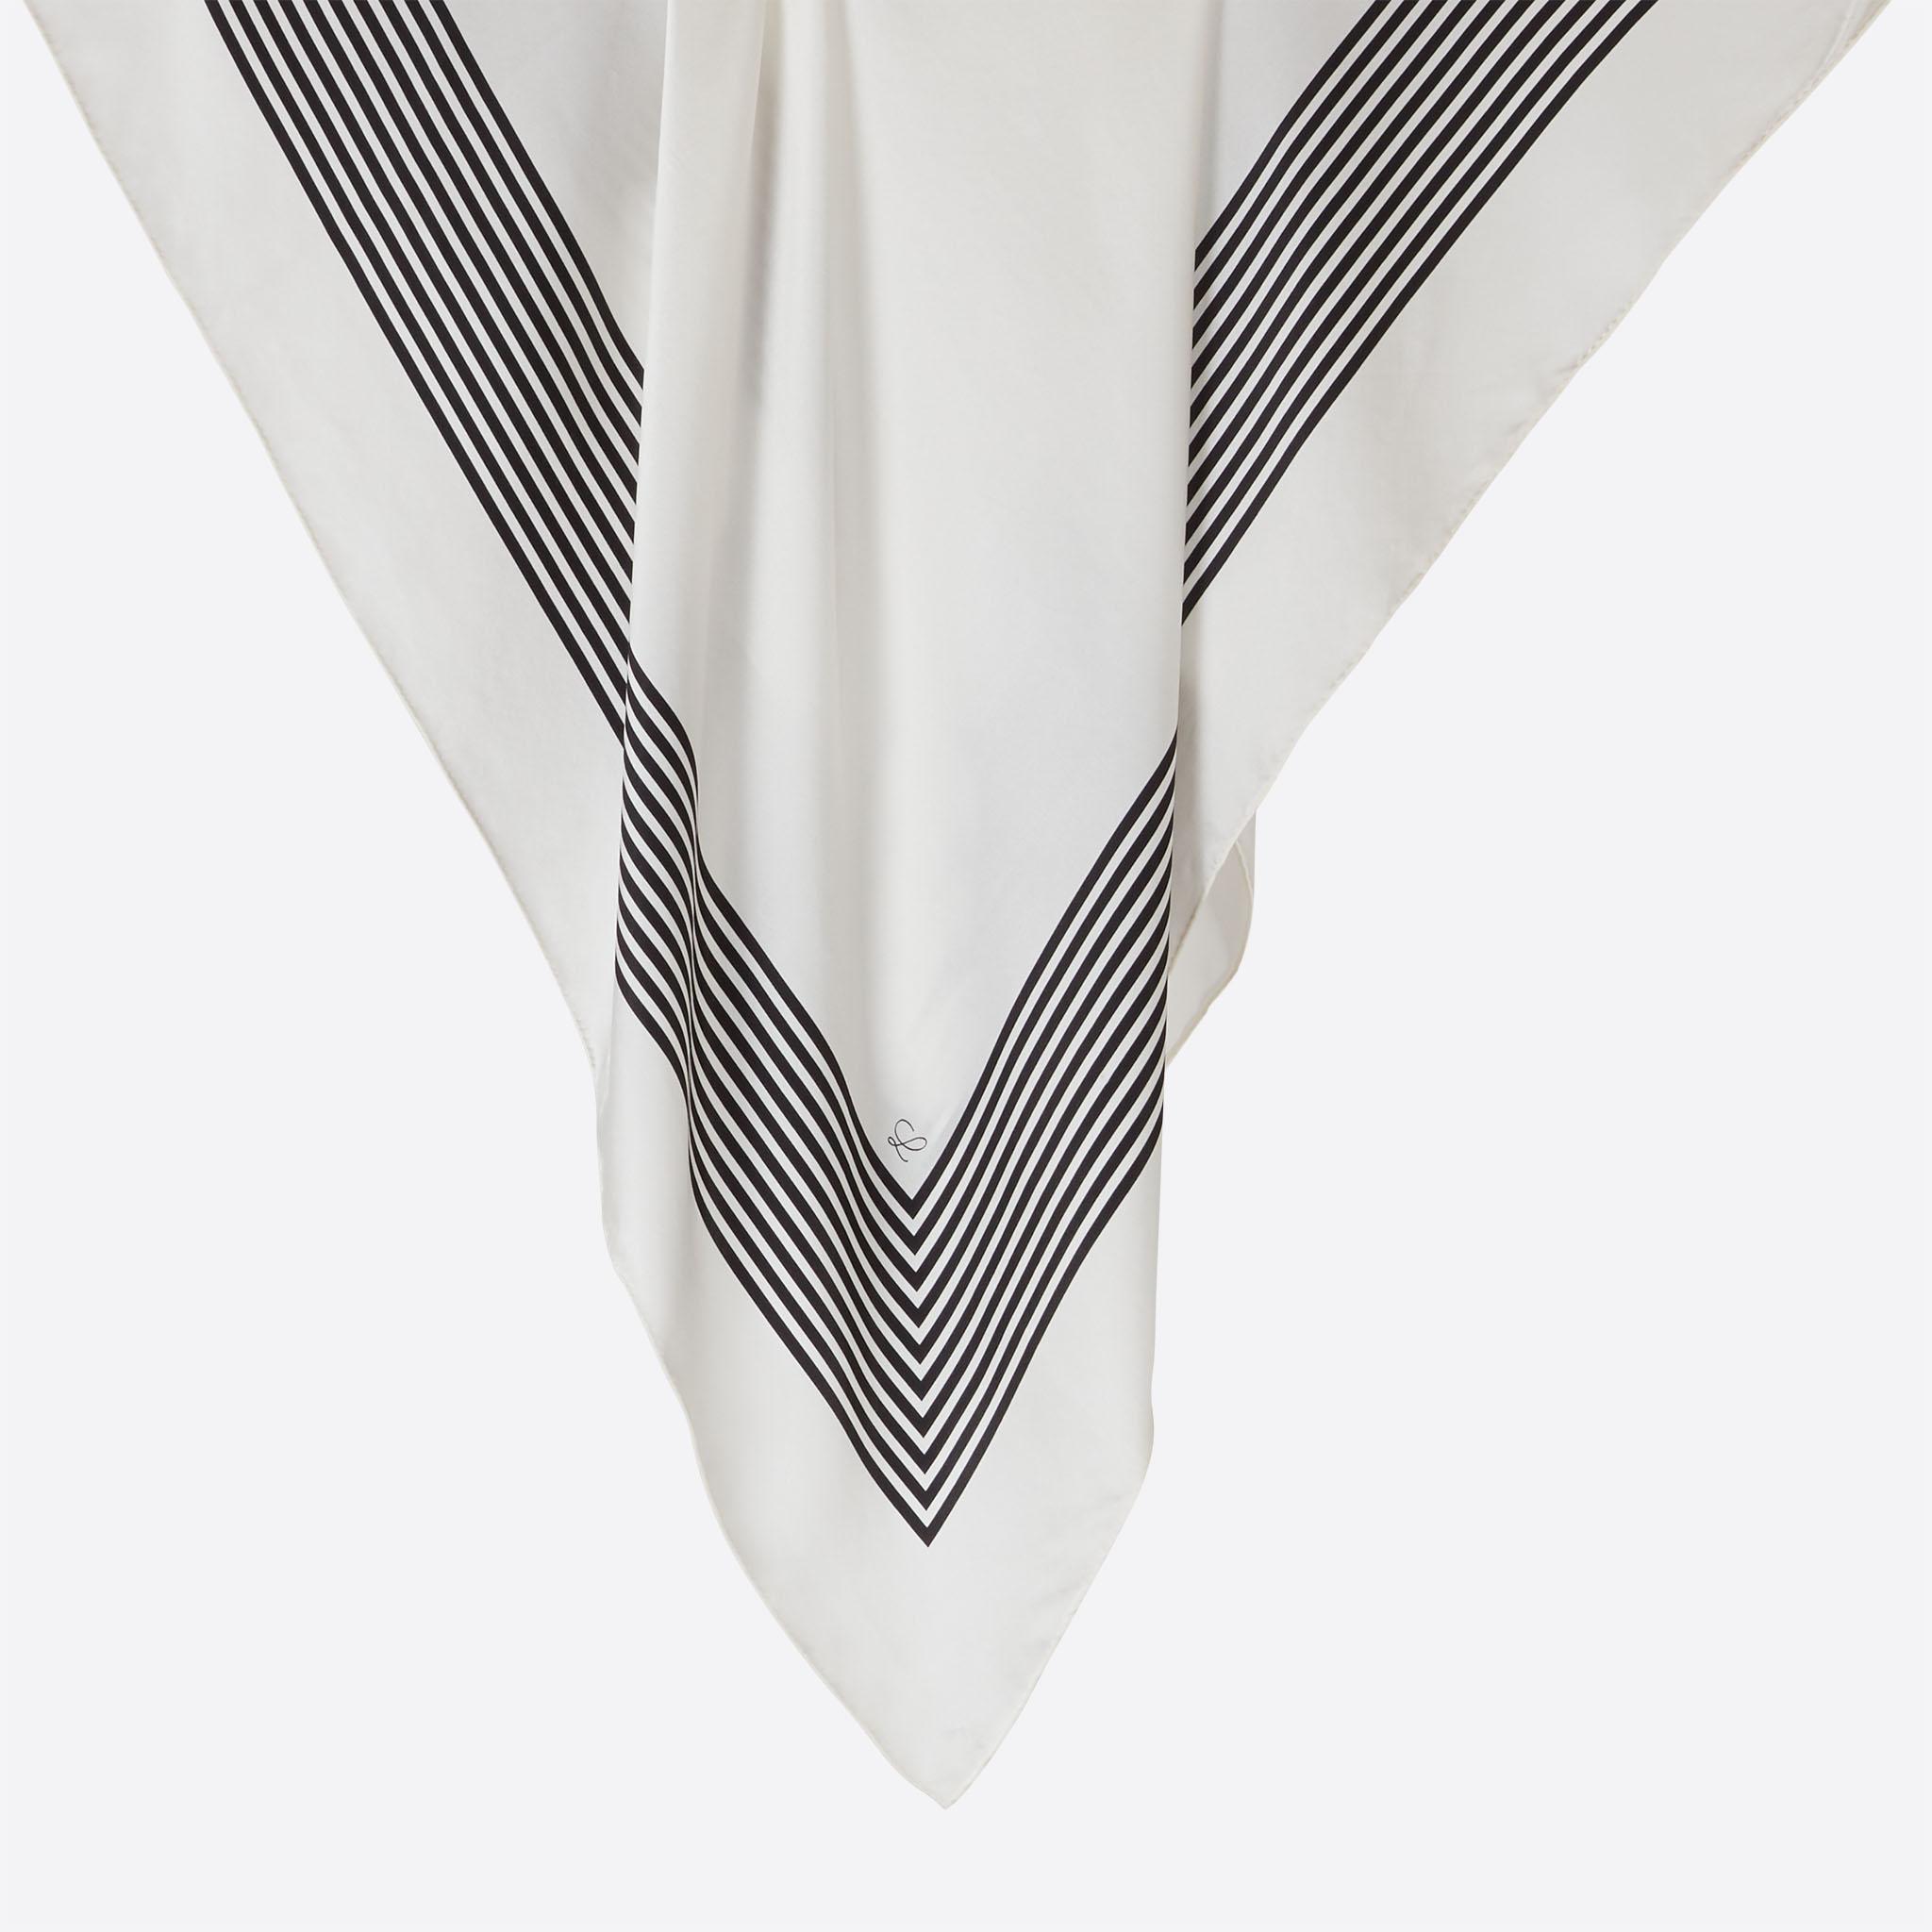 Lalouette white striped square silk scarf hanging